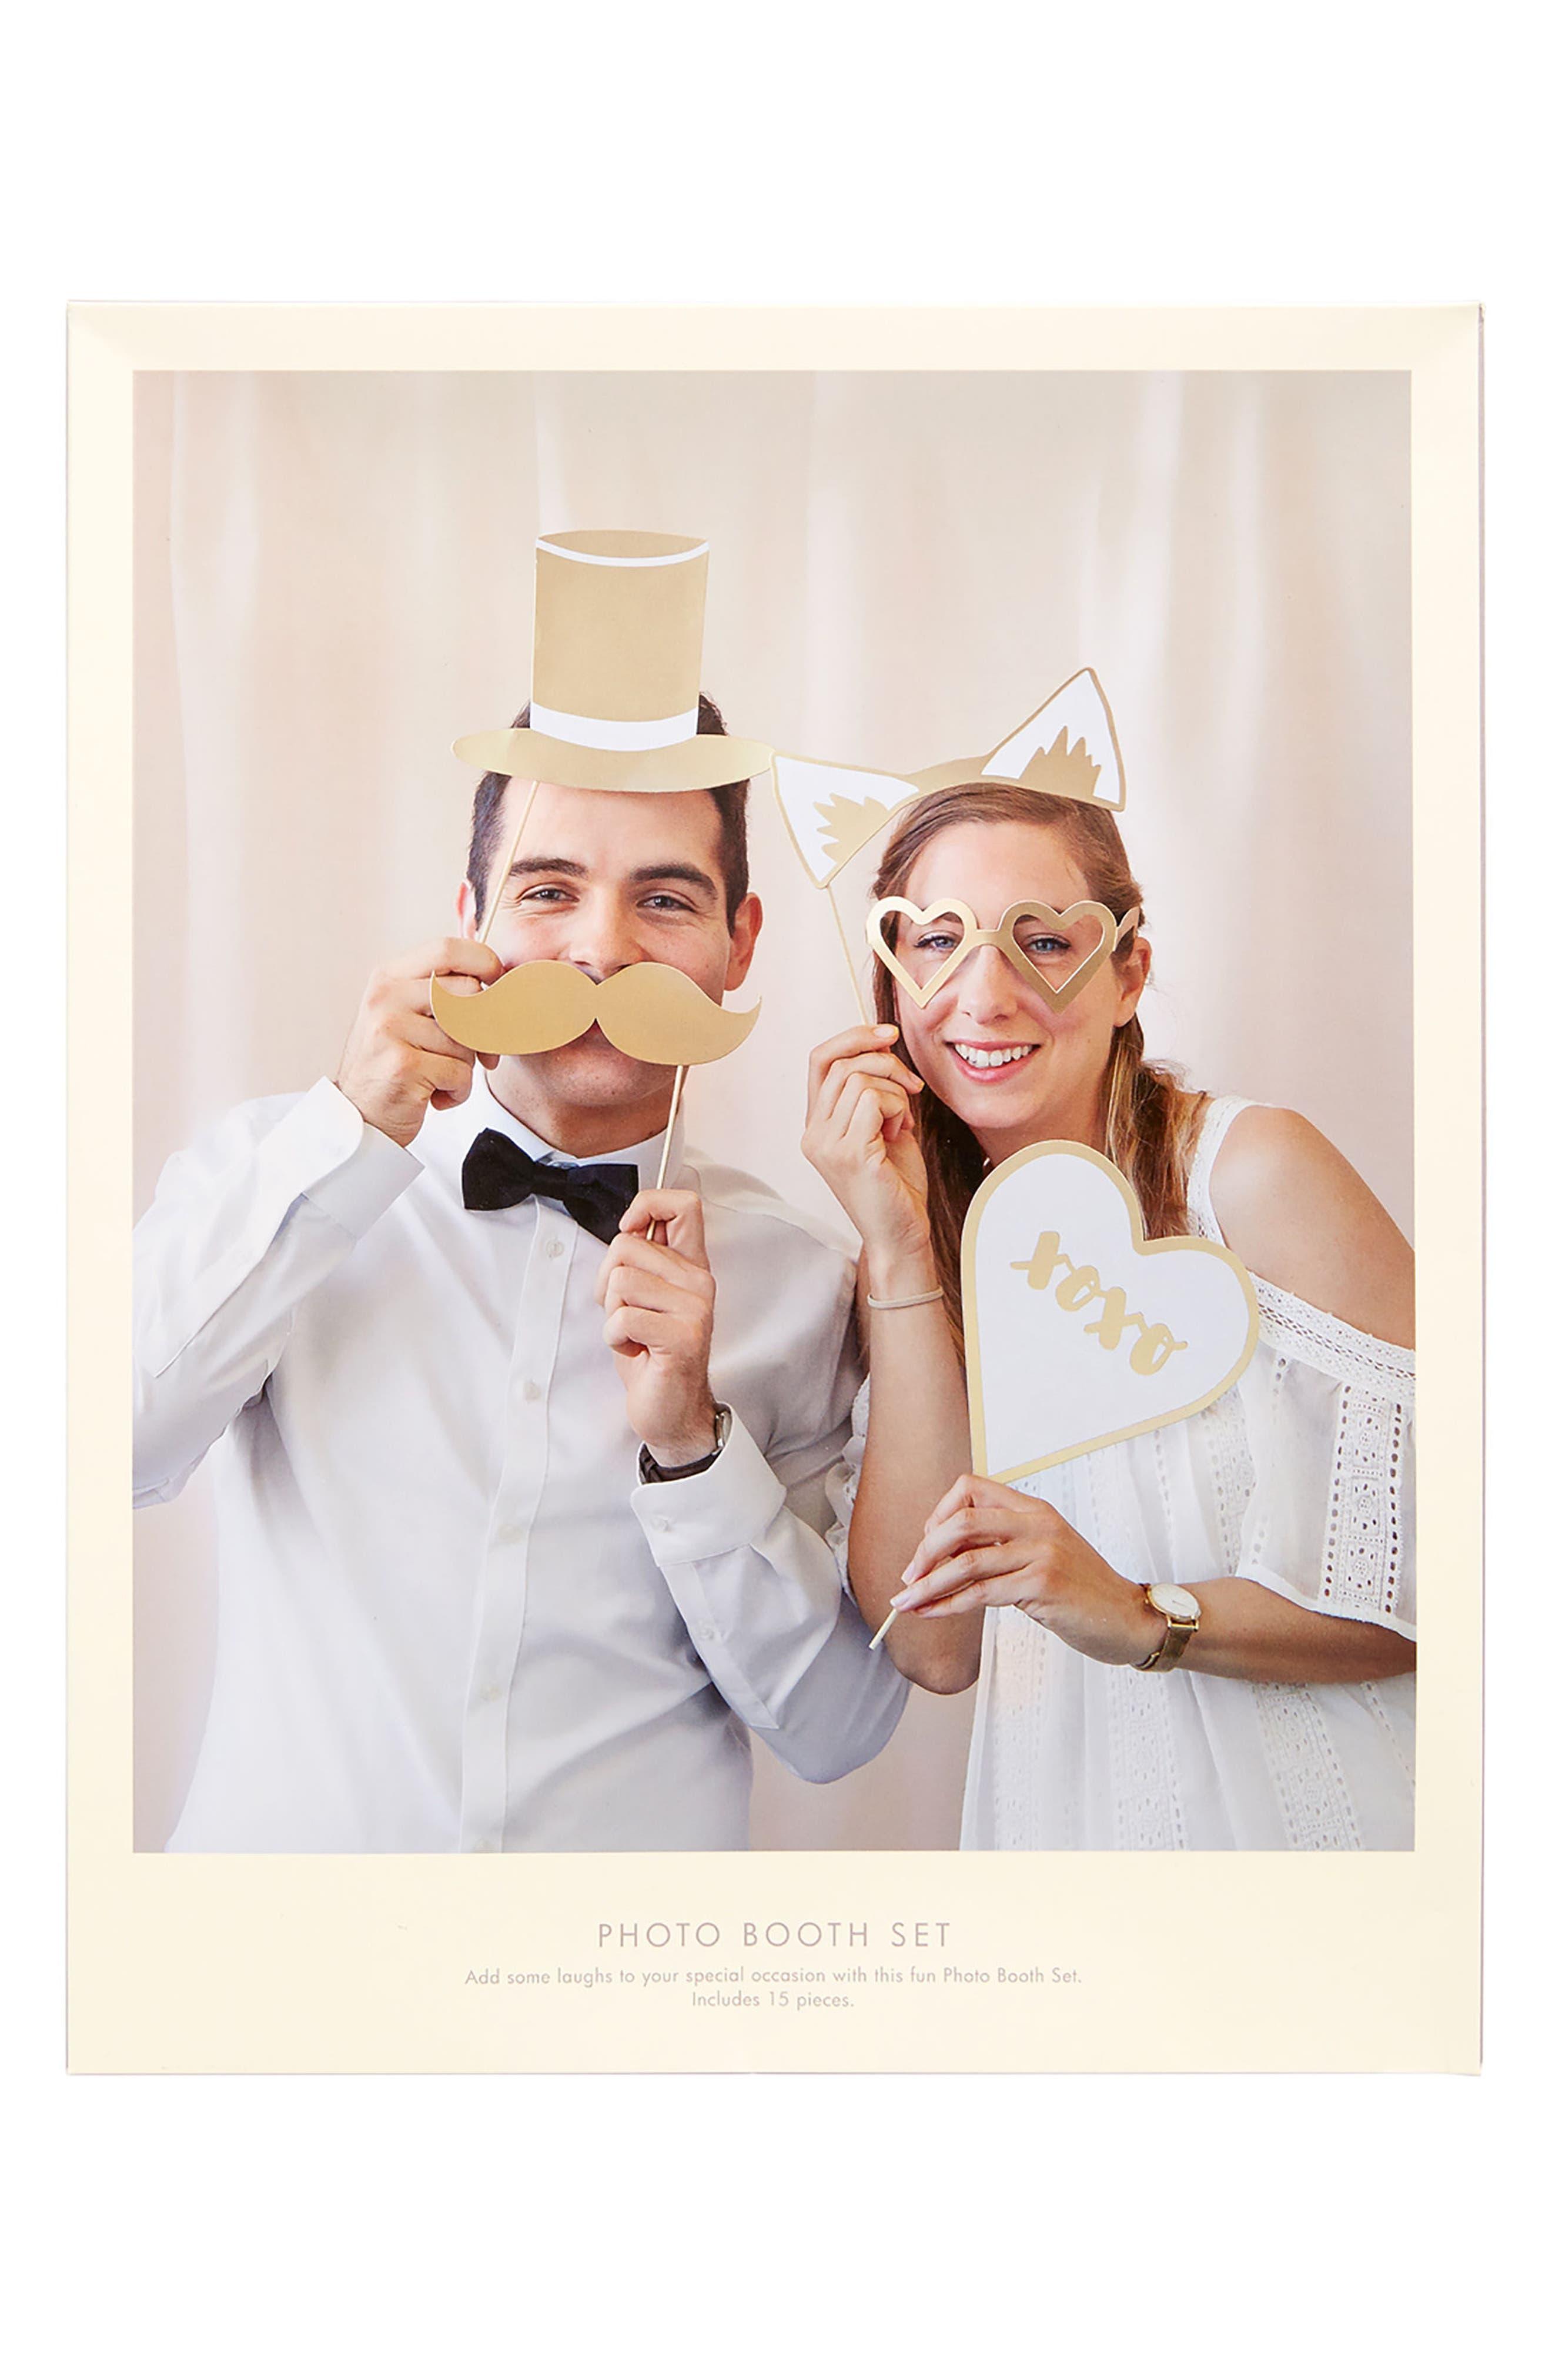 15-Piece Wedding Photo Booth Prop Set,                             Alternate thumbnail 2, color,                             White